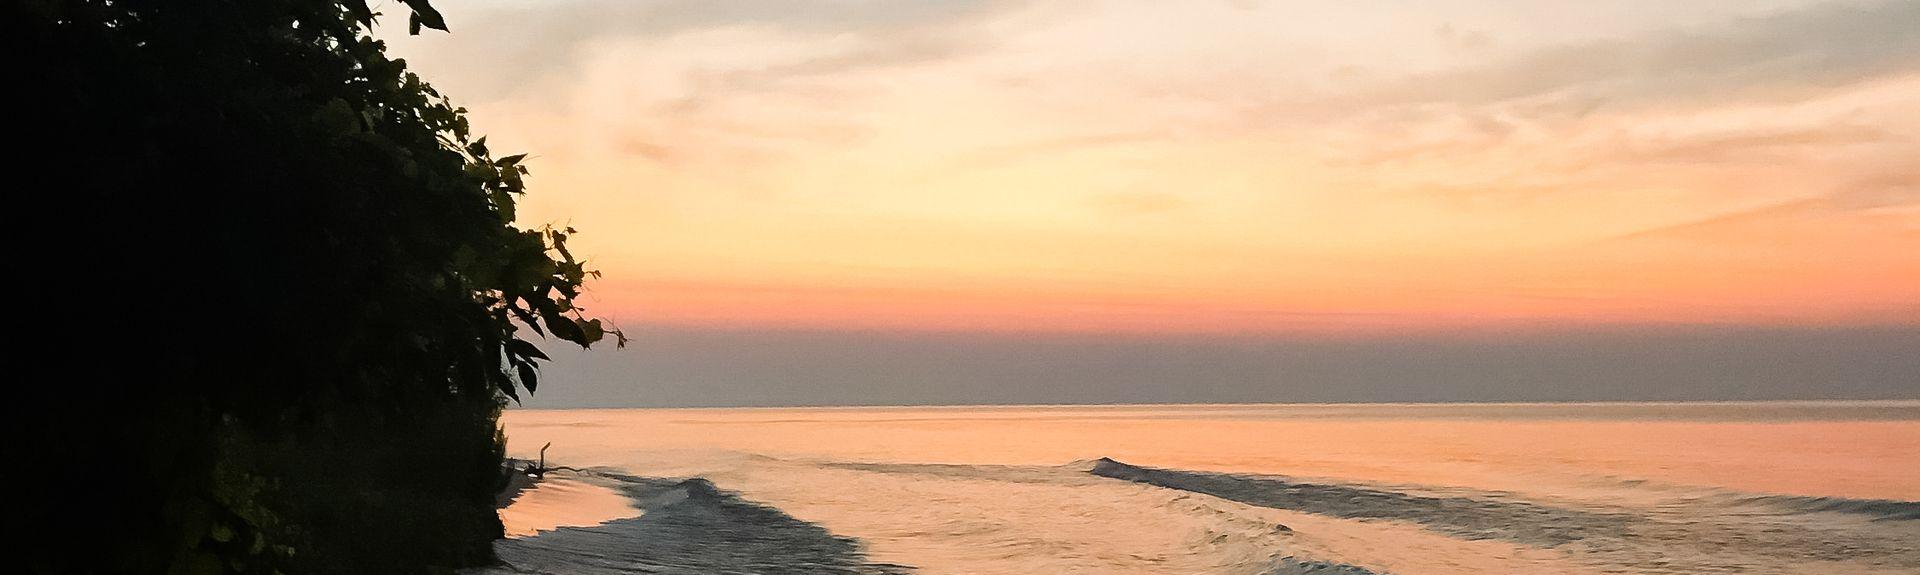 Elkhart Lake, Wisconsin, Stati Uniti d'America